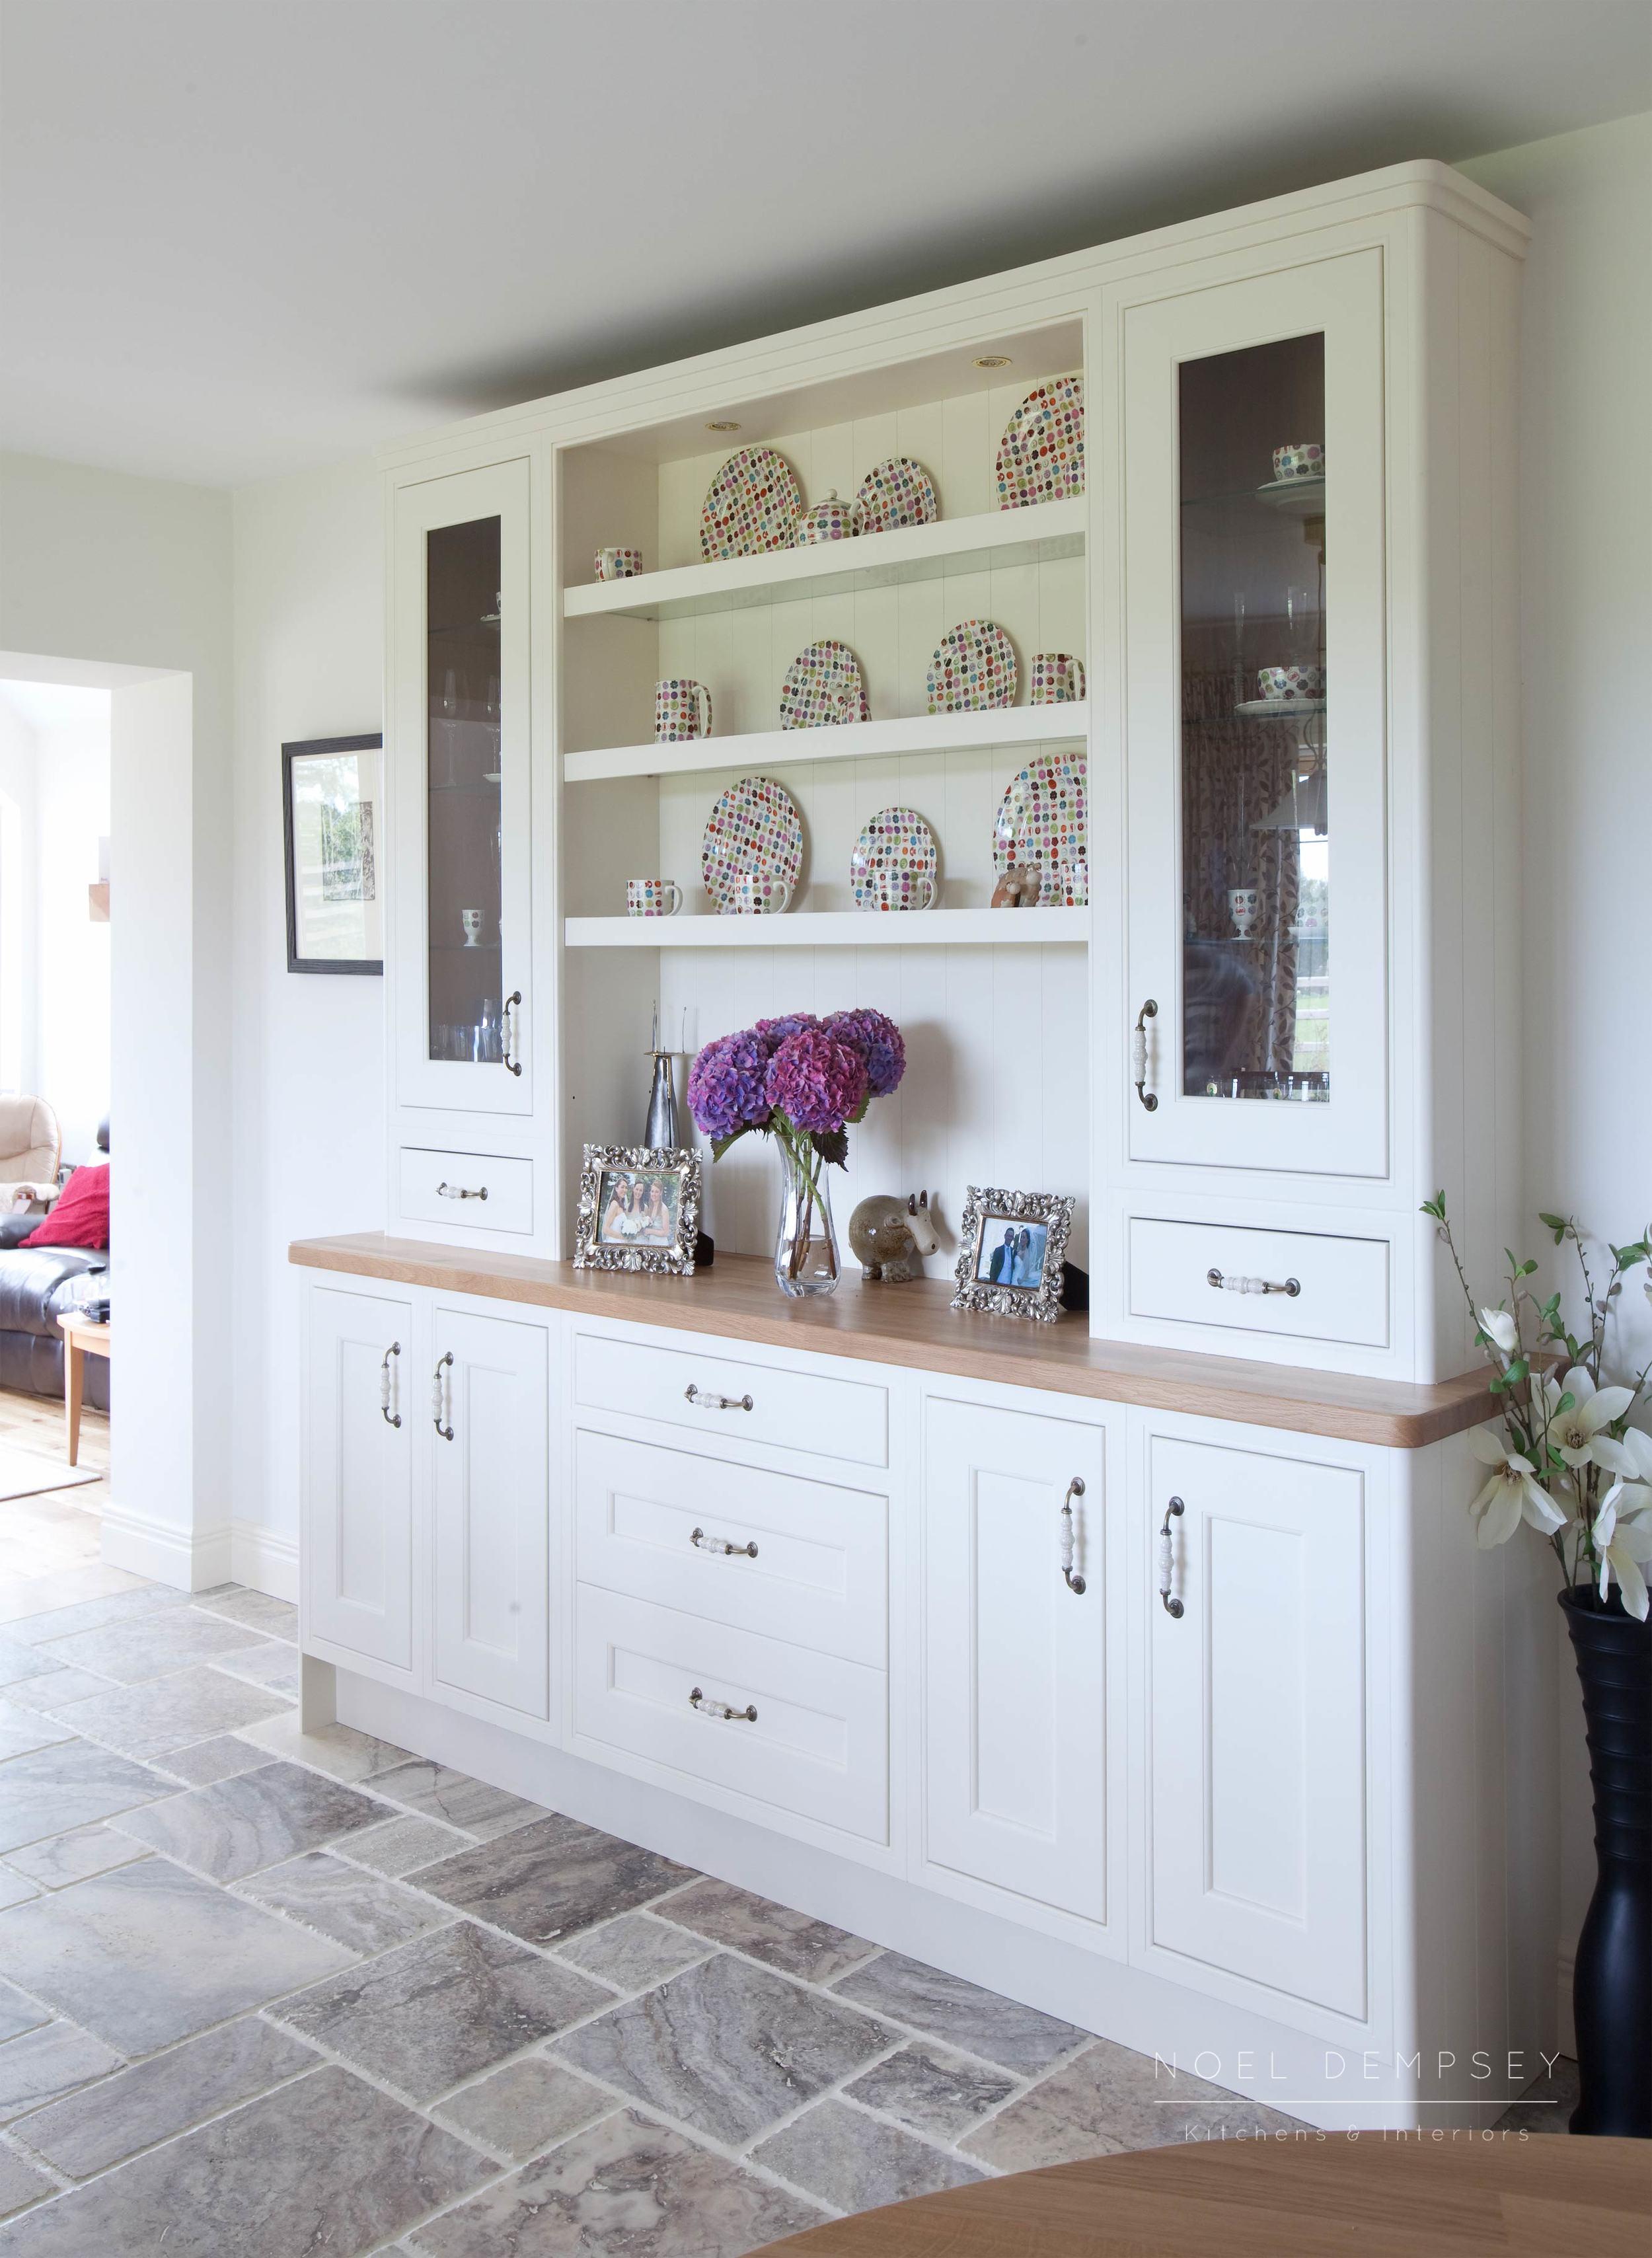 Fox-lane-inframe-hand-painted-kitchens-6.jpg